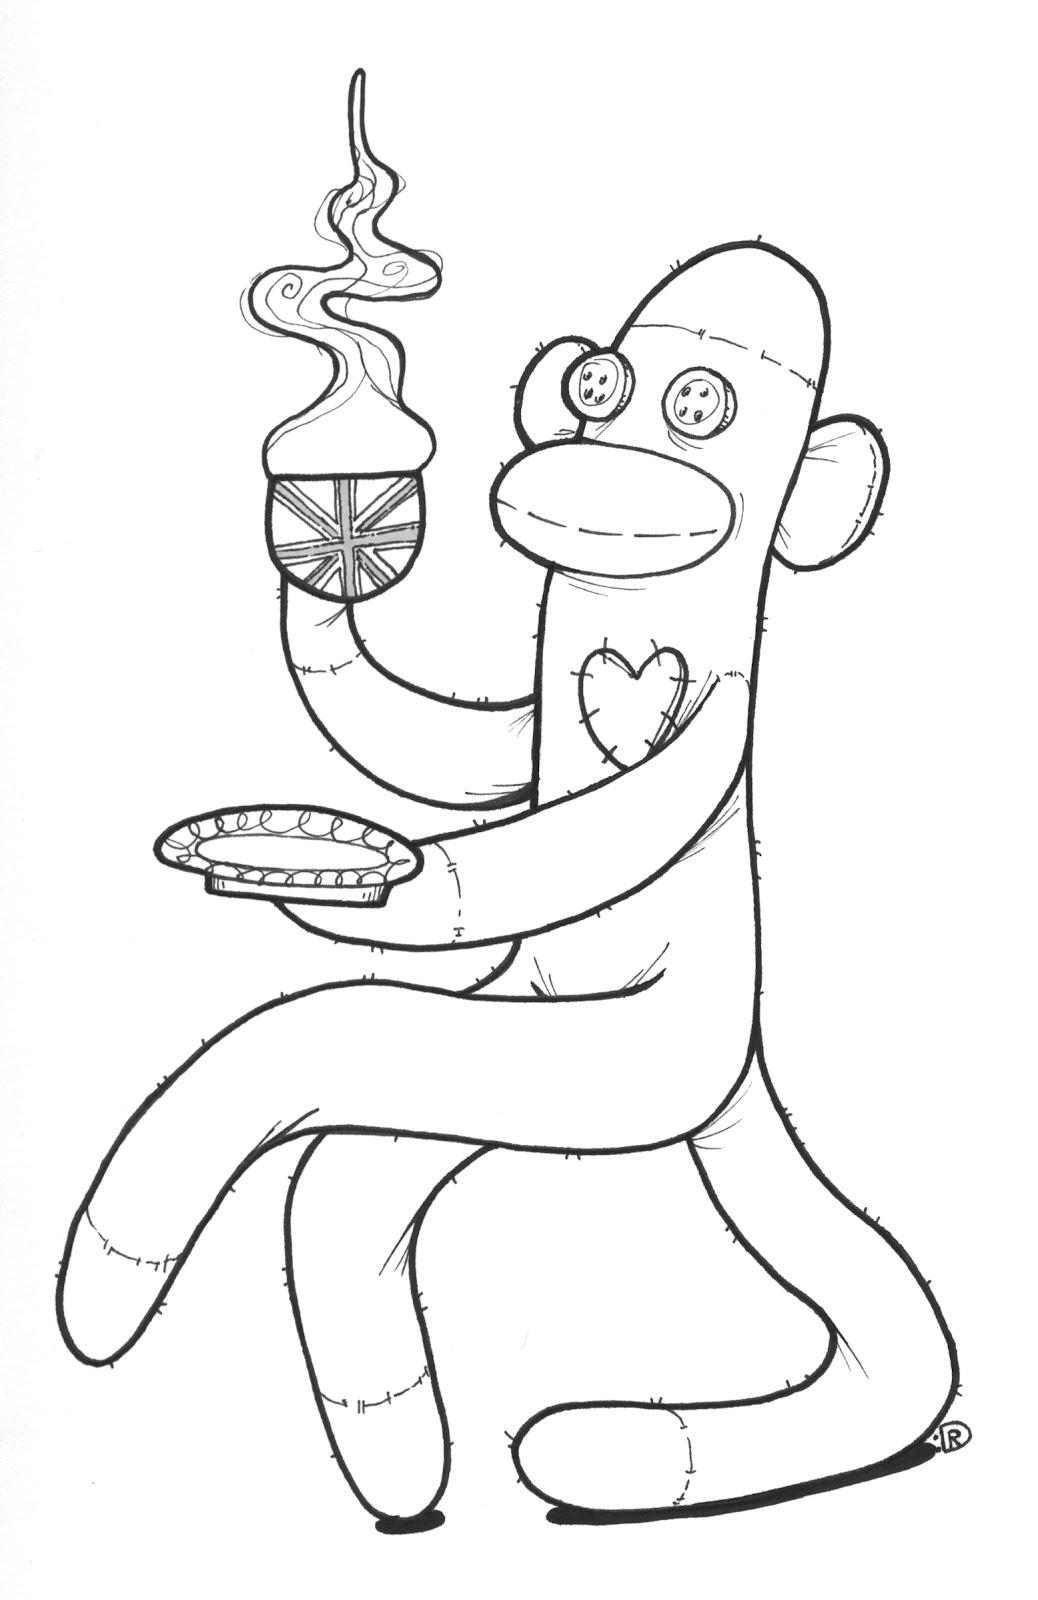 1038x1600 draw monkey monkey de sock - Monkey Pictures To Color